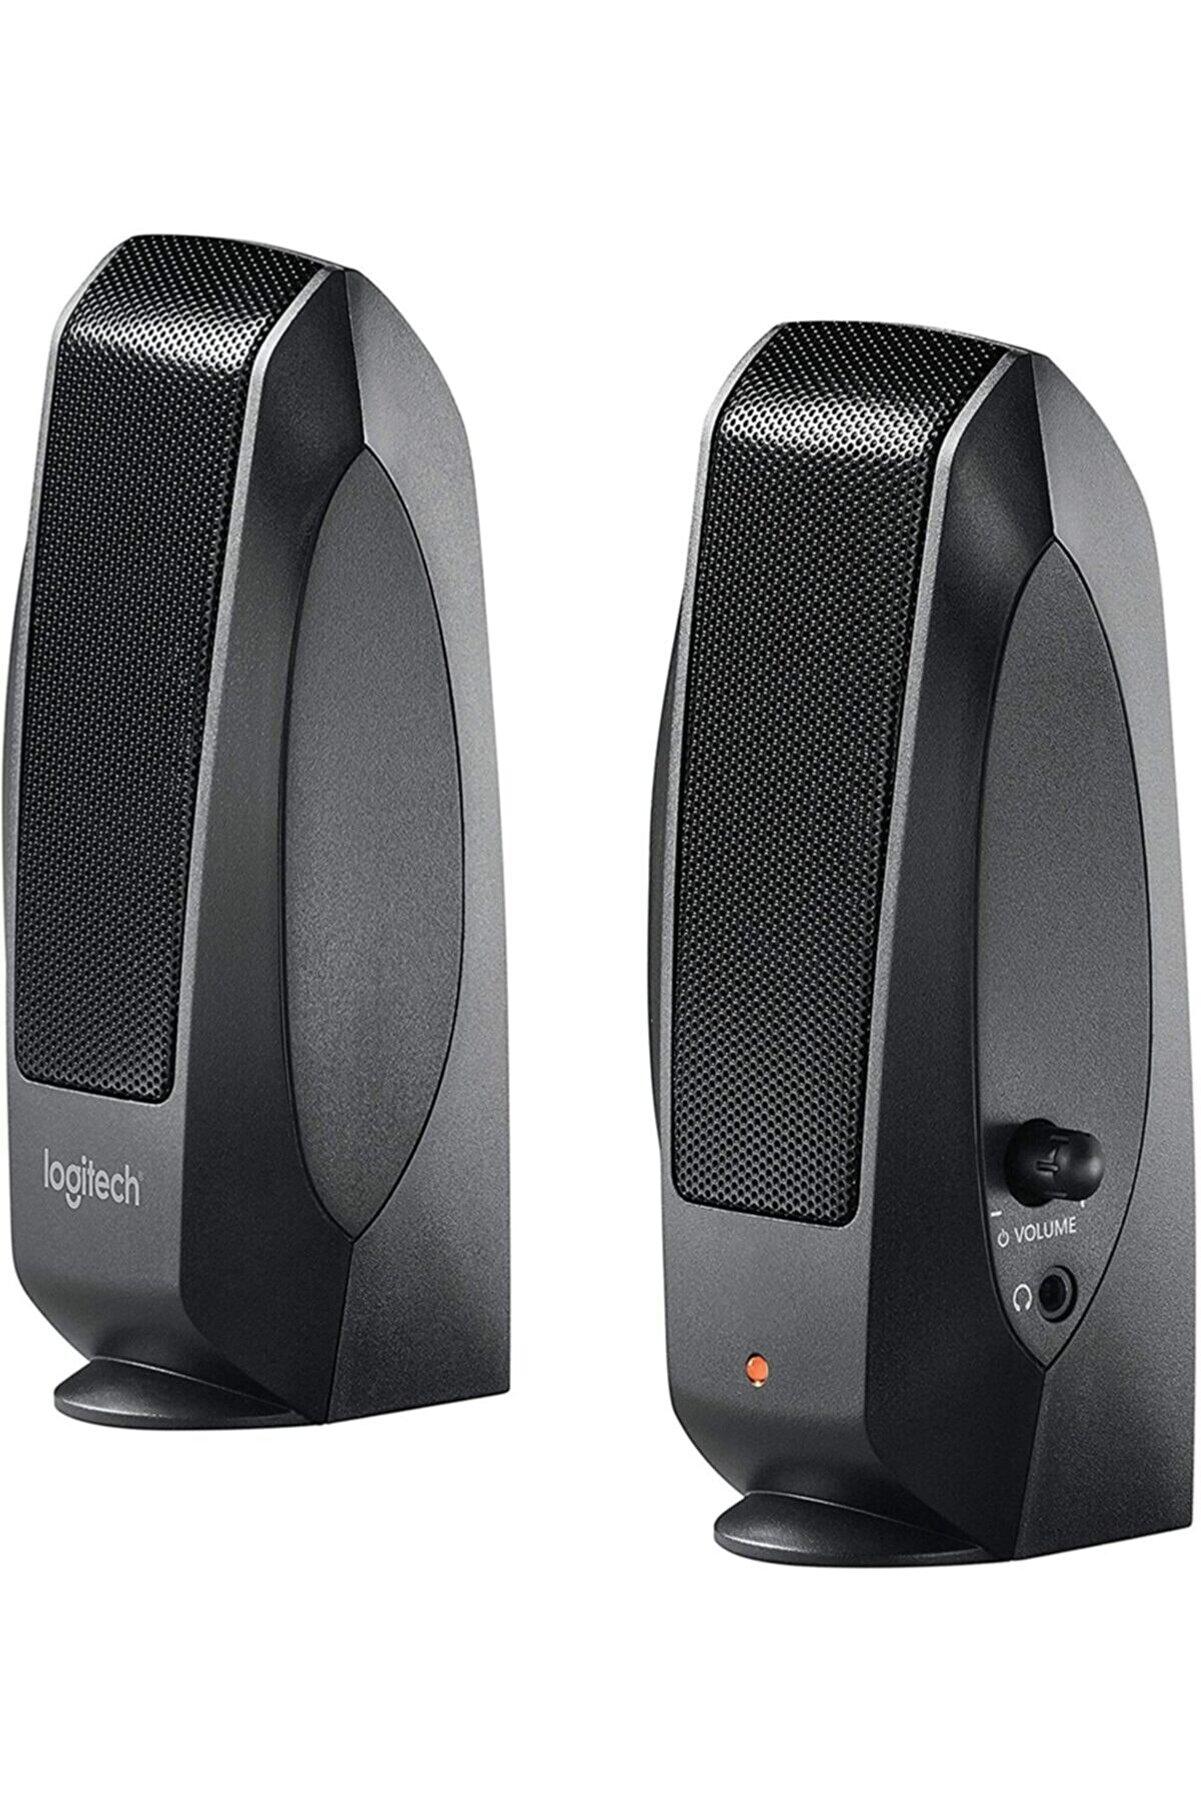 logitech S120 1+1 Siyah Speaker Yeni Seri Rms 4.4w 980-000010